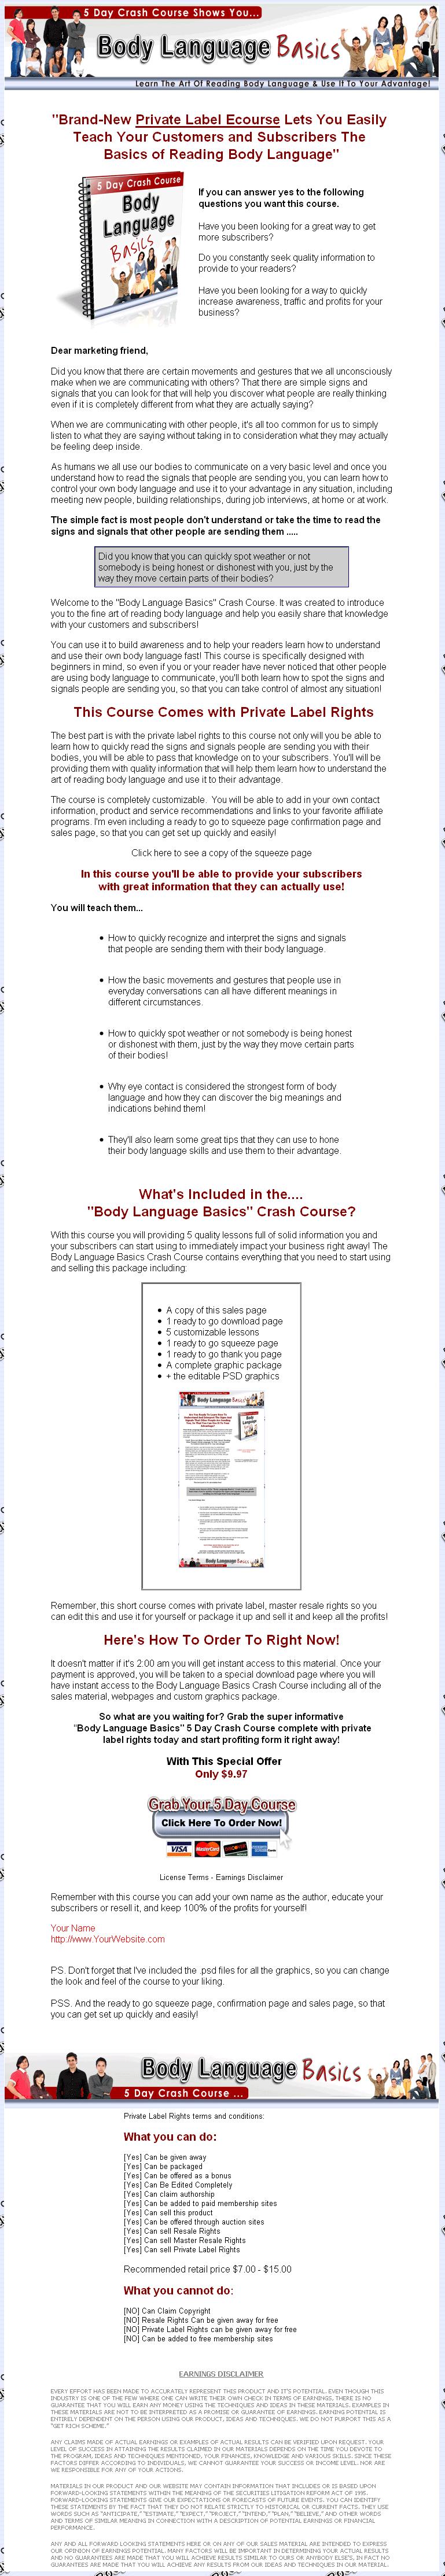 Body Language Basics Autoresponder Messages Series PLR